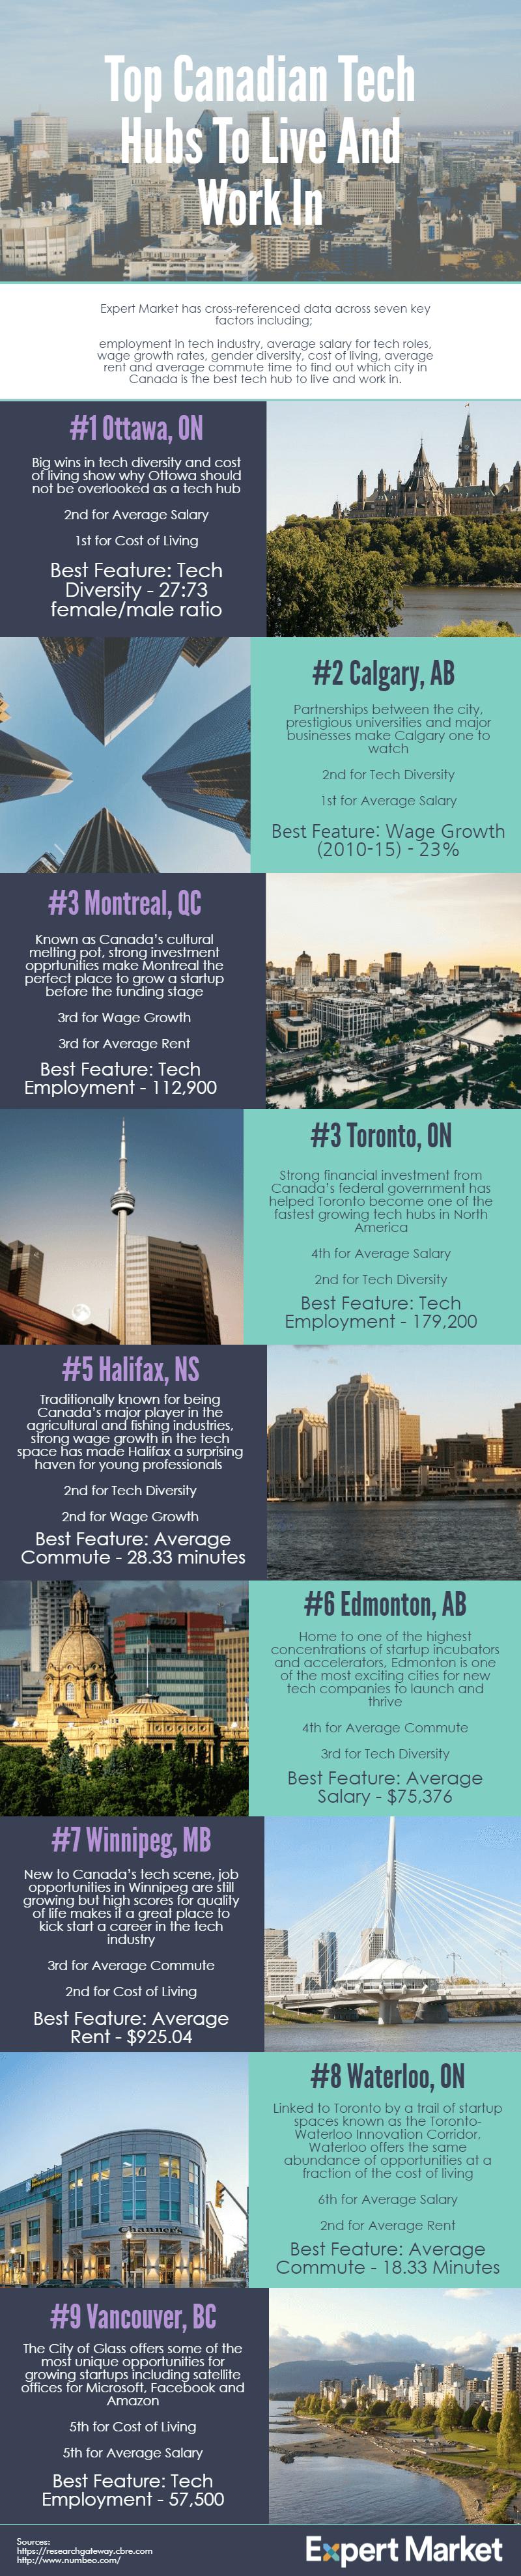 Tech hubs in Canada